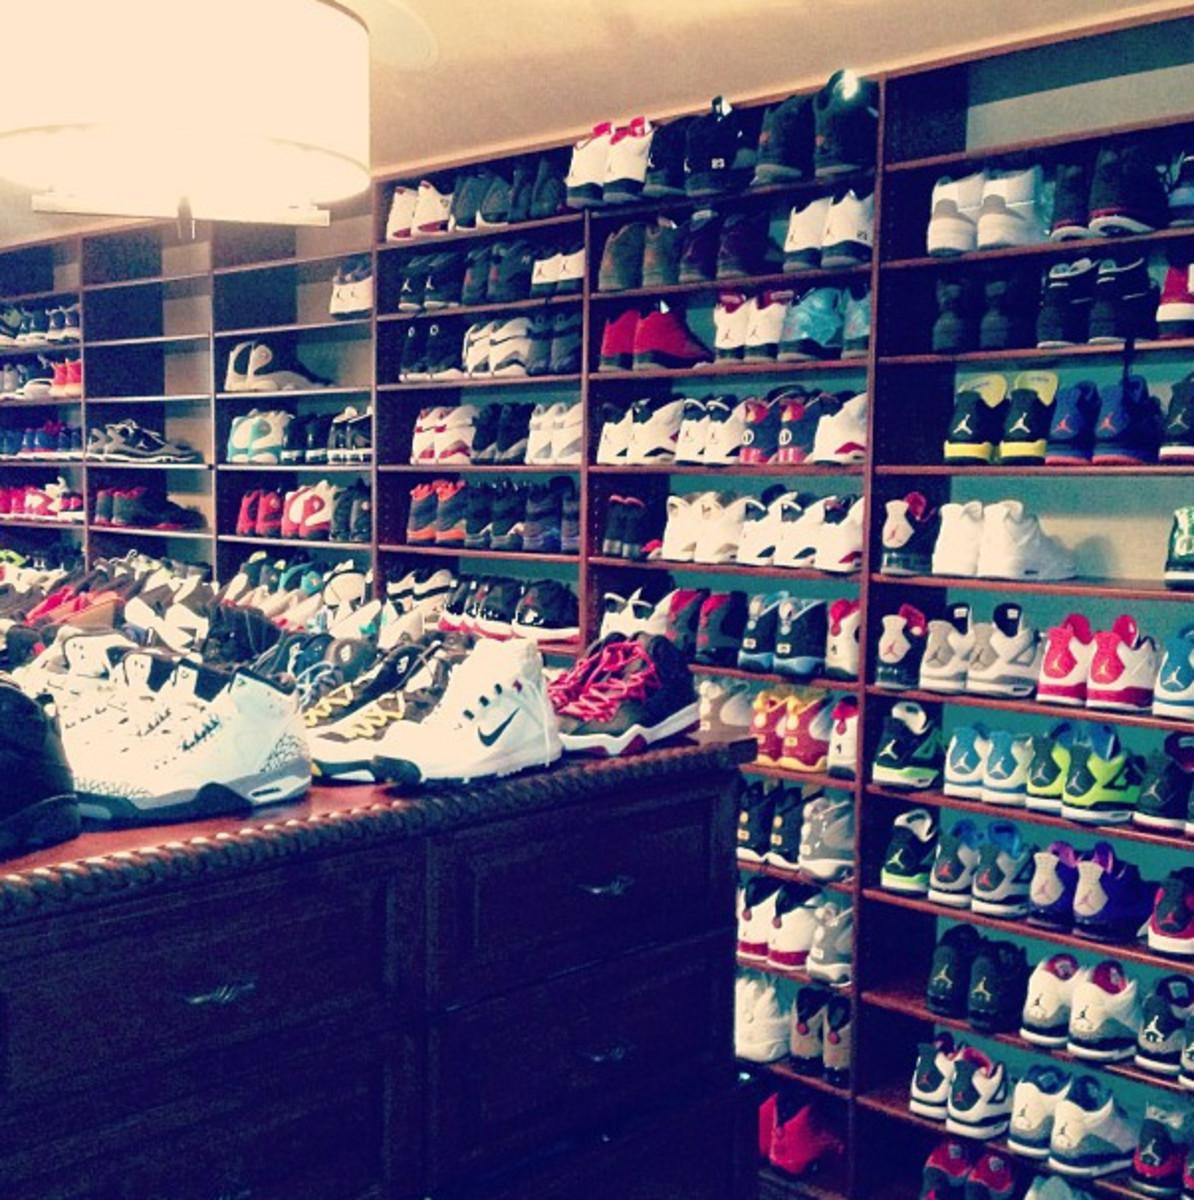 Chris Paul's shoe closet (jada_ap on Instagram)